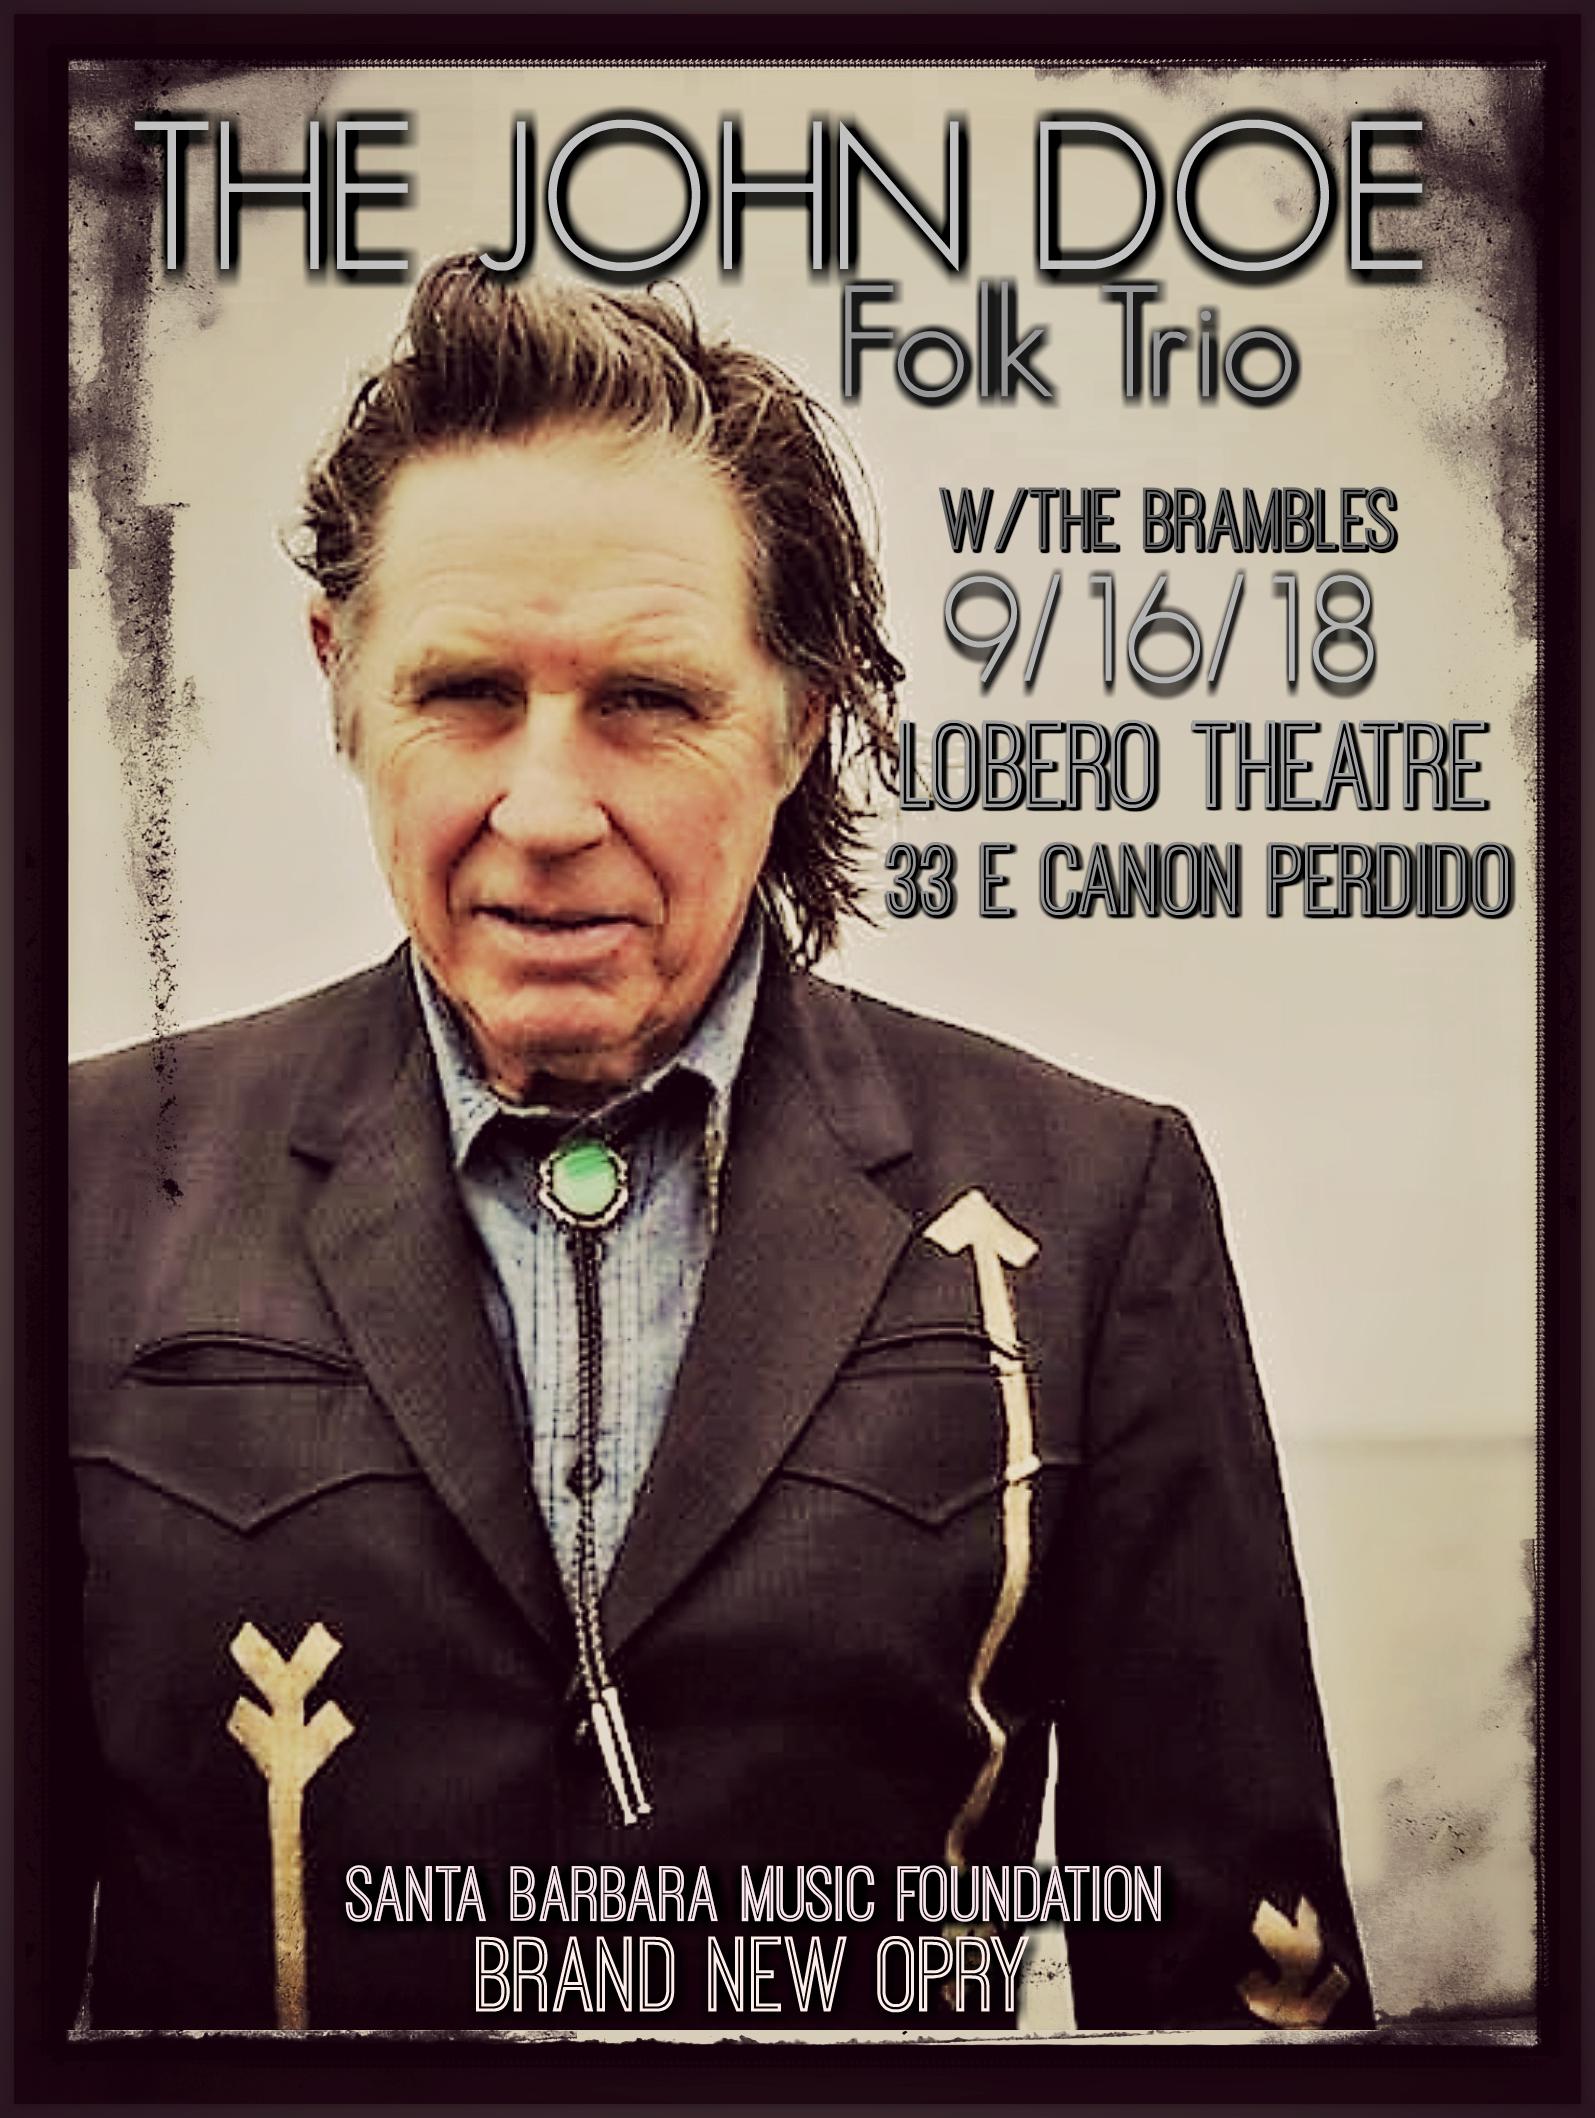 The John Doe Folk Trio at The Lobero Santa Barbara